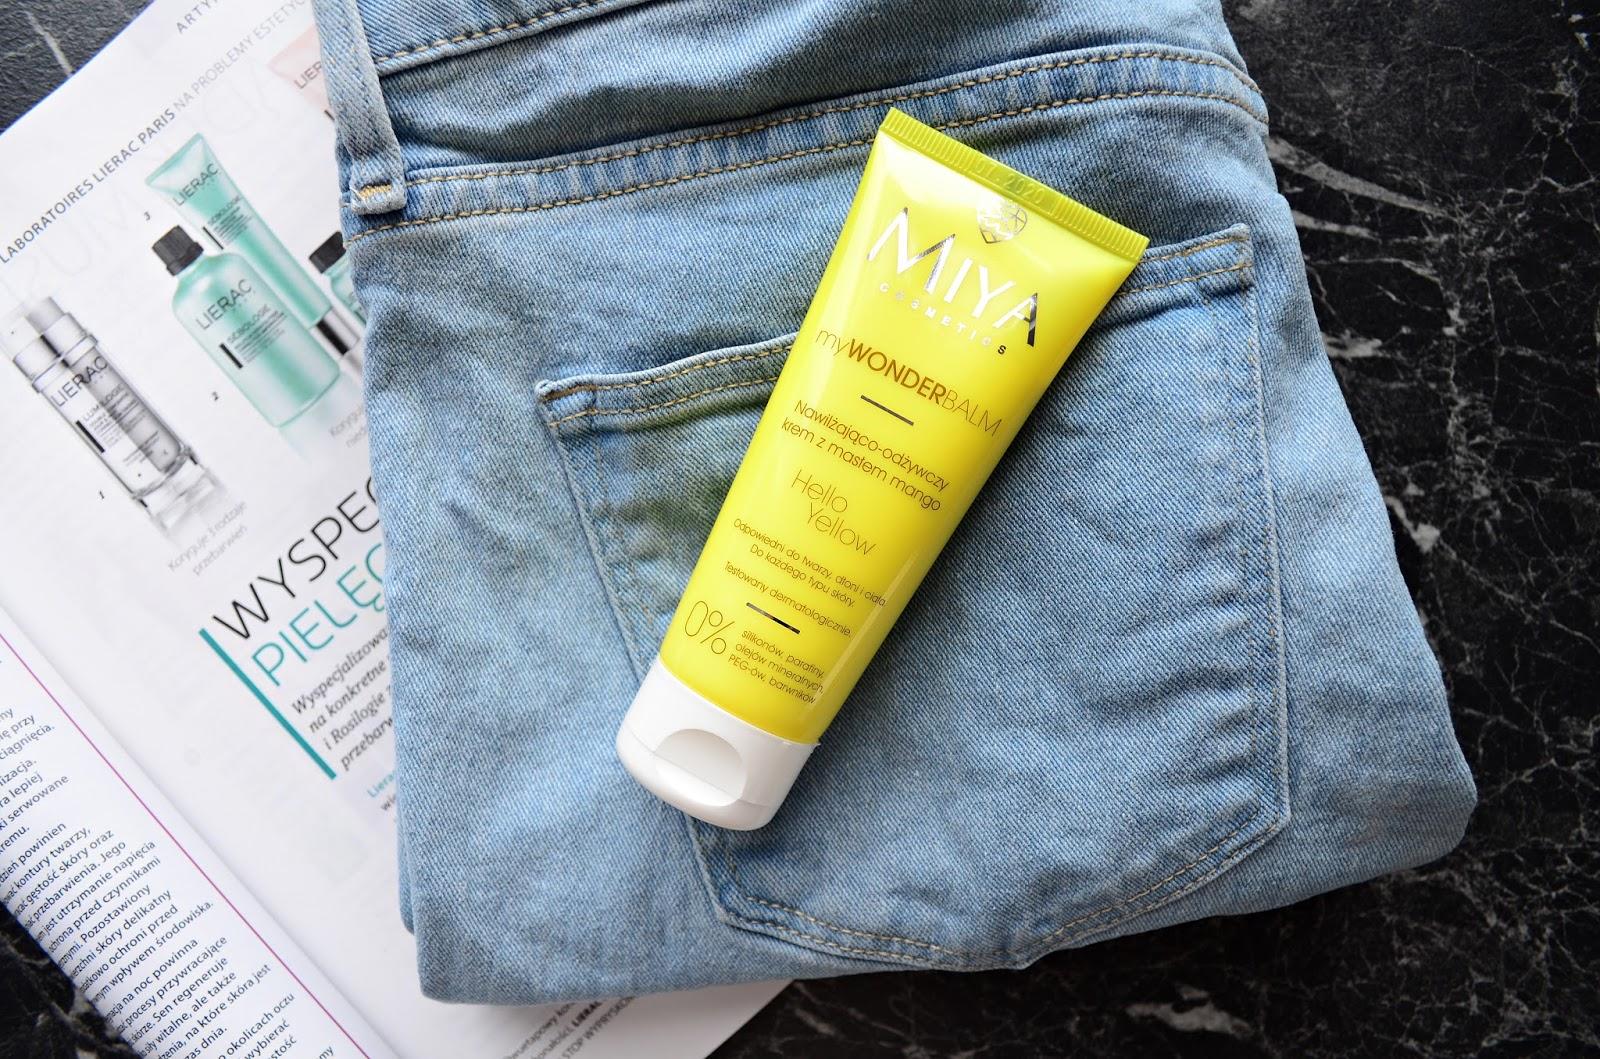 Review: Miya Cosmetics myWonderBalm Hello Yellow moisturizing cream with mango butter